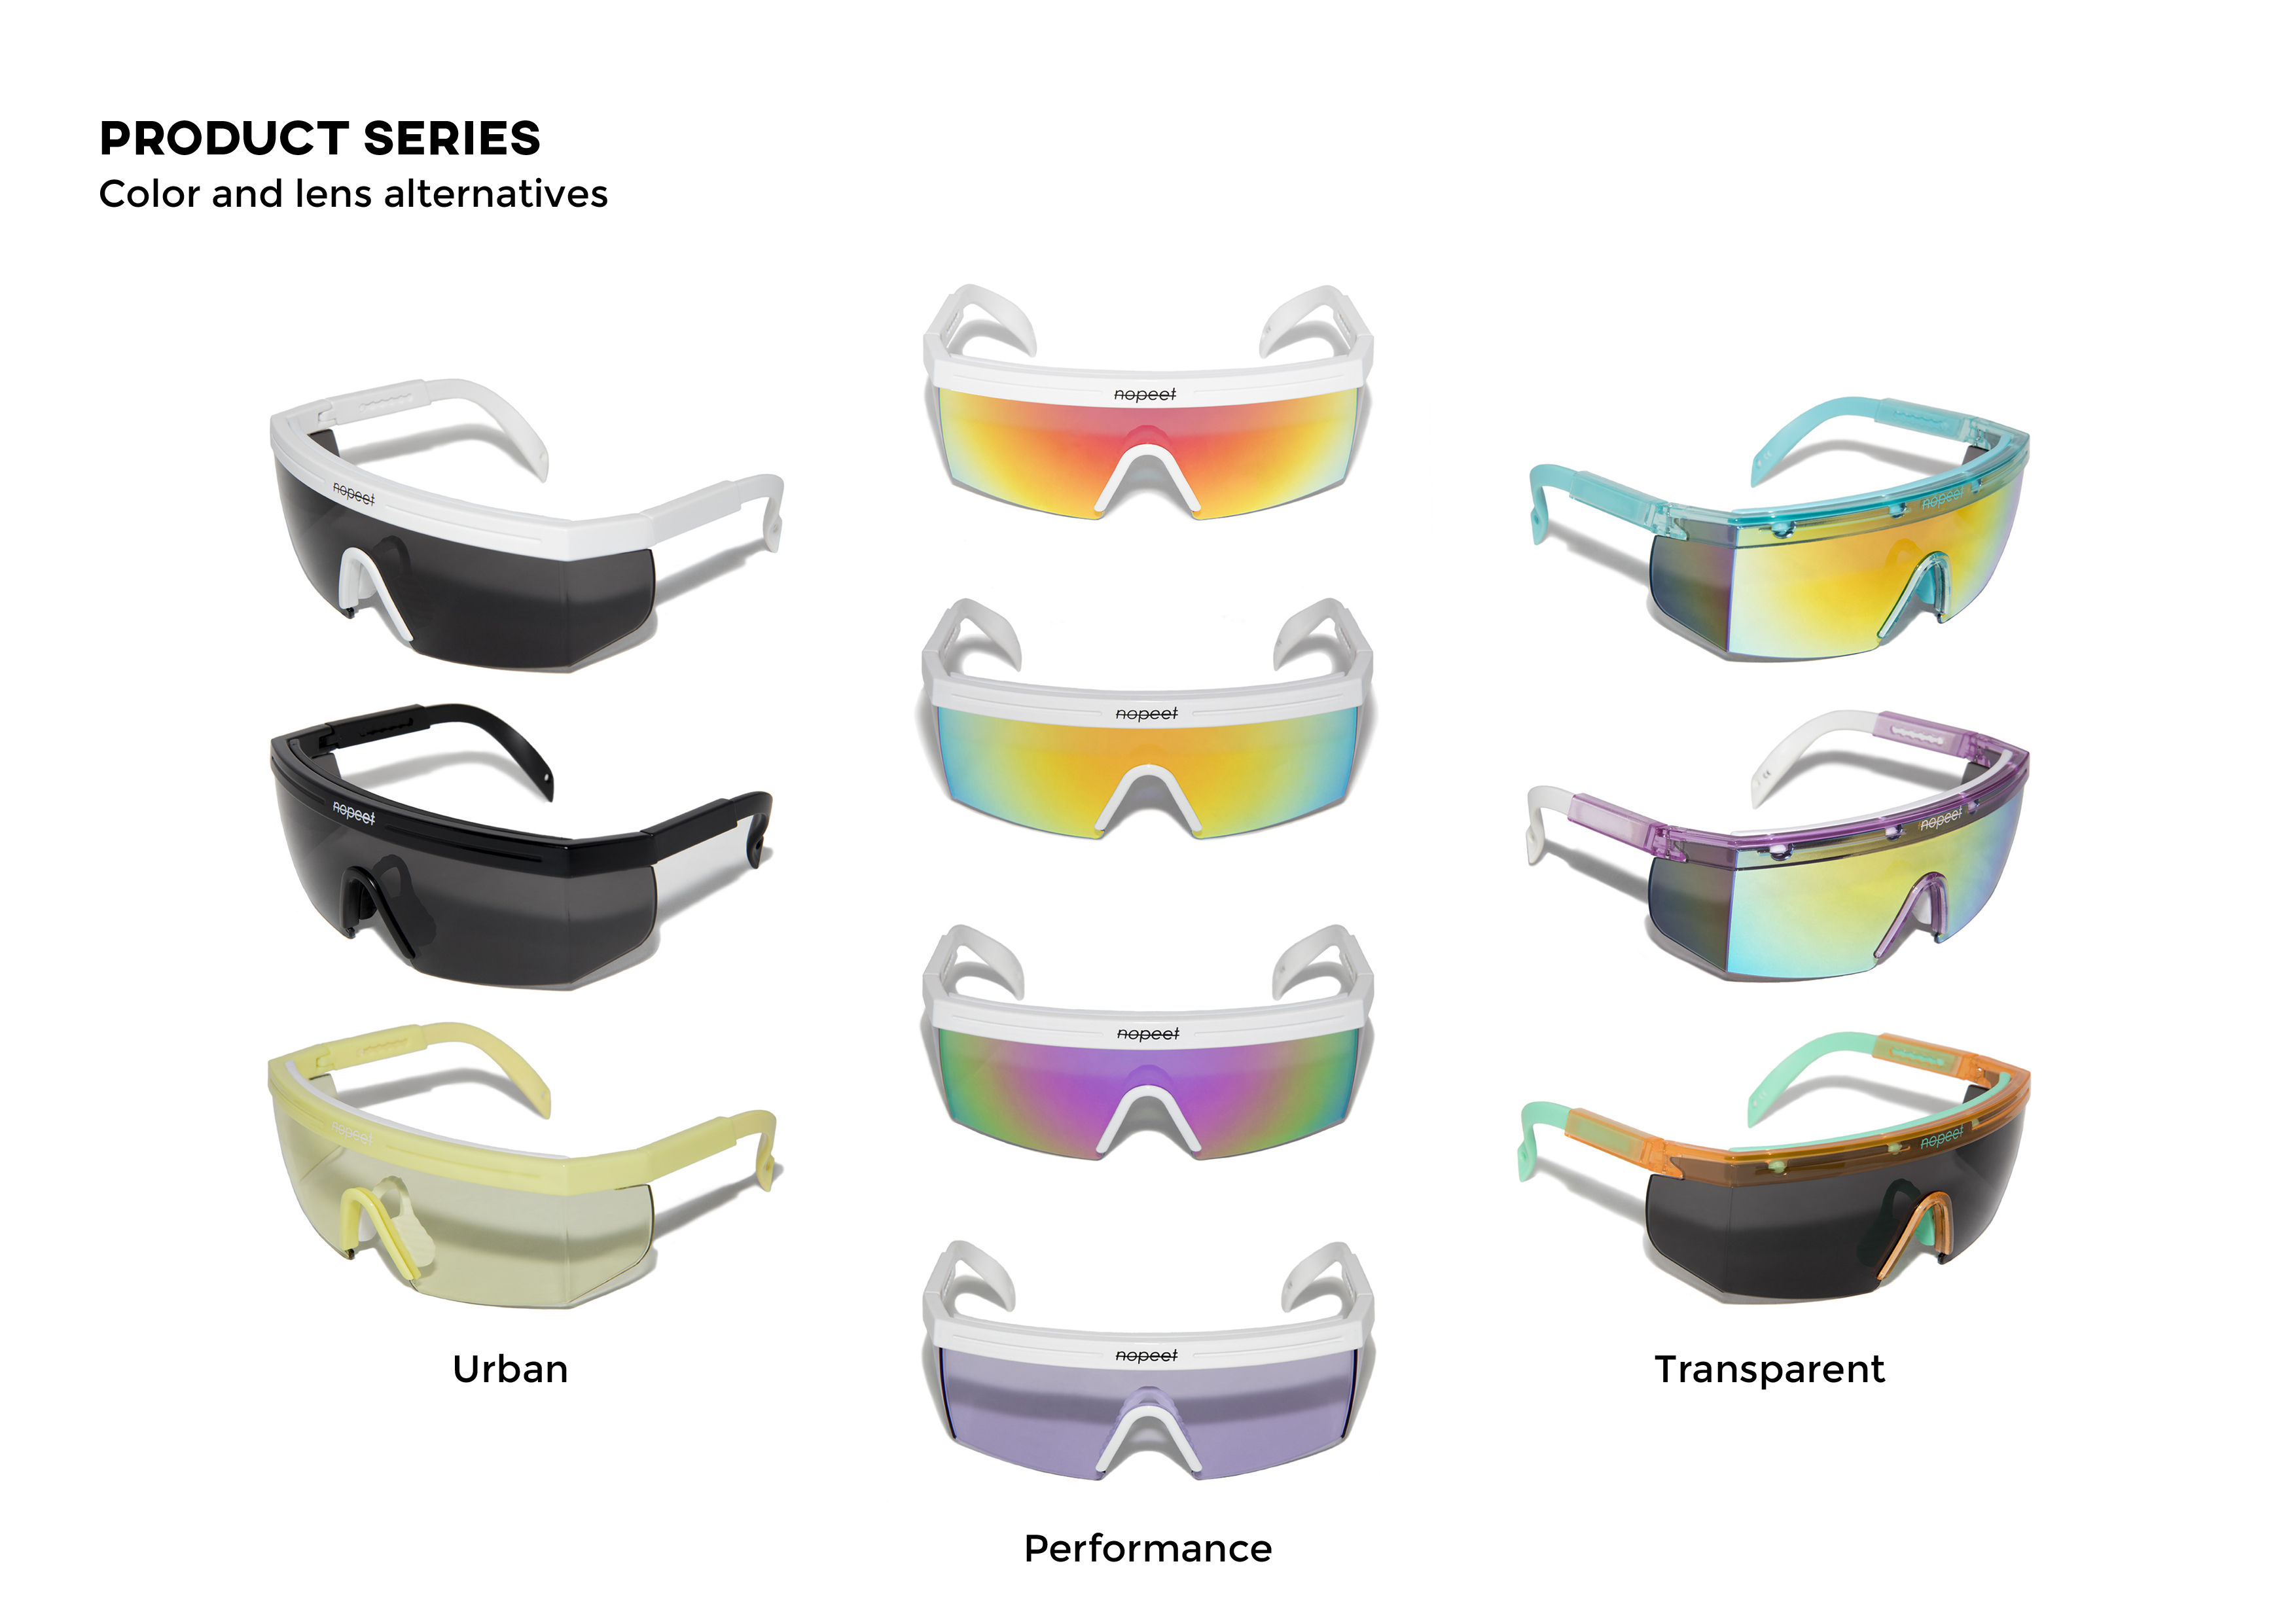 adc4aa5b69 Nopeet 2025 - Performance Eyewear on Behance